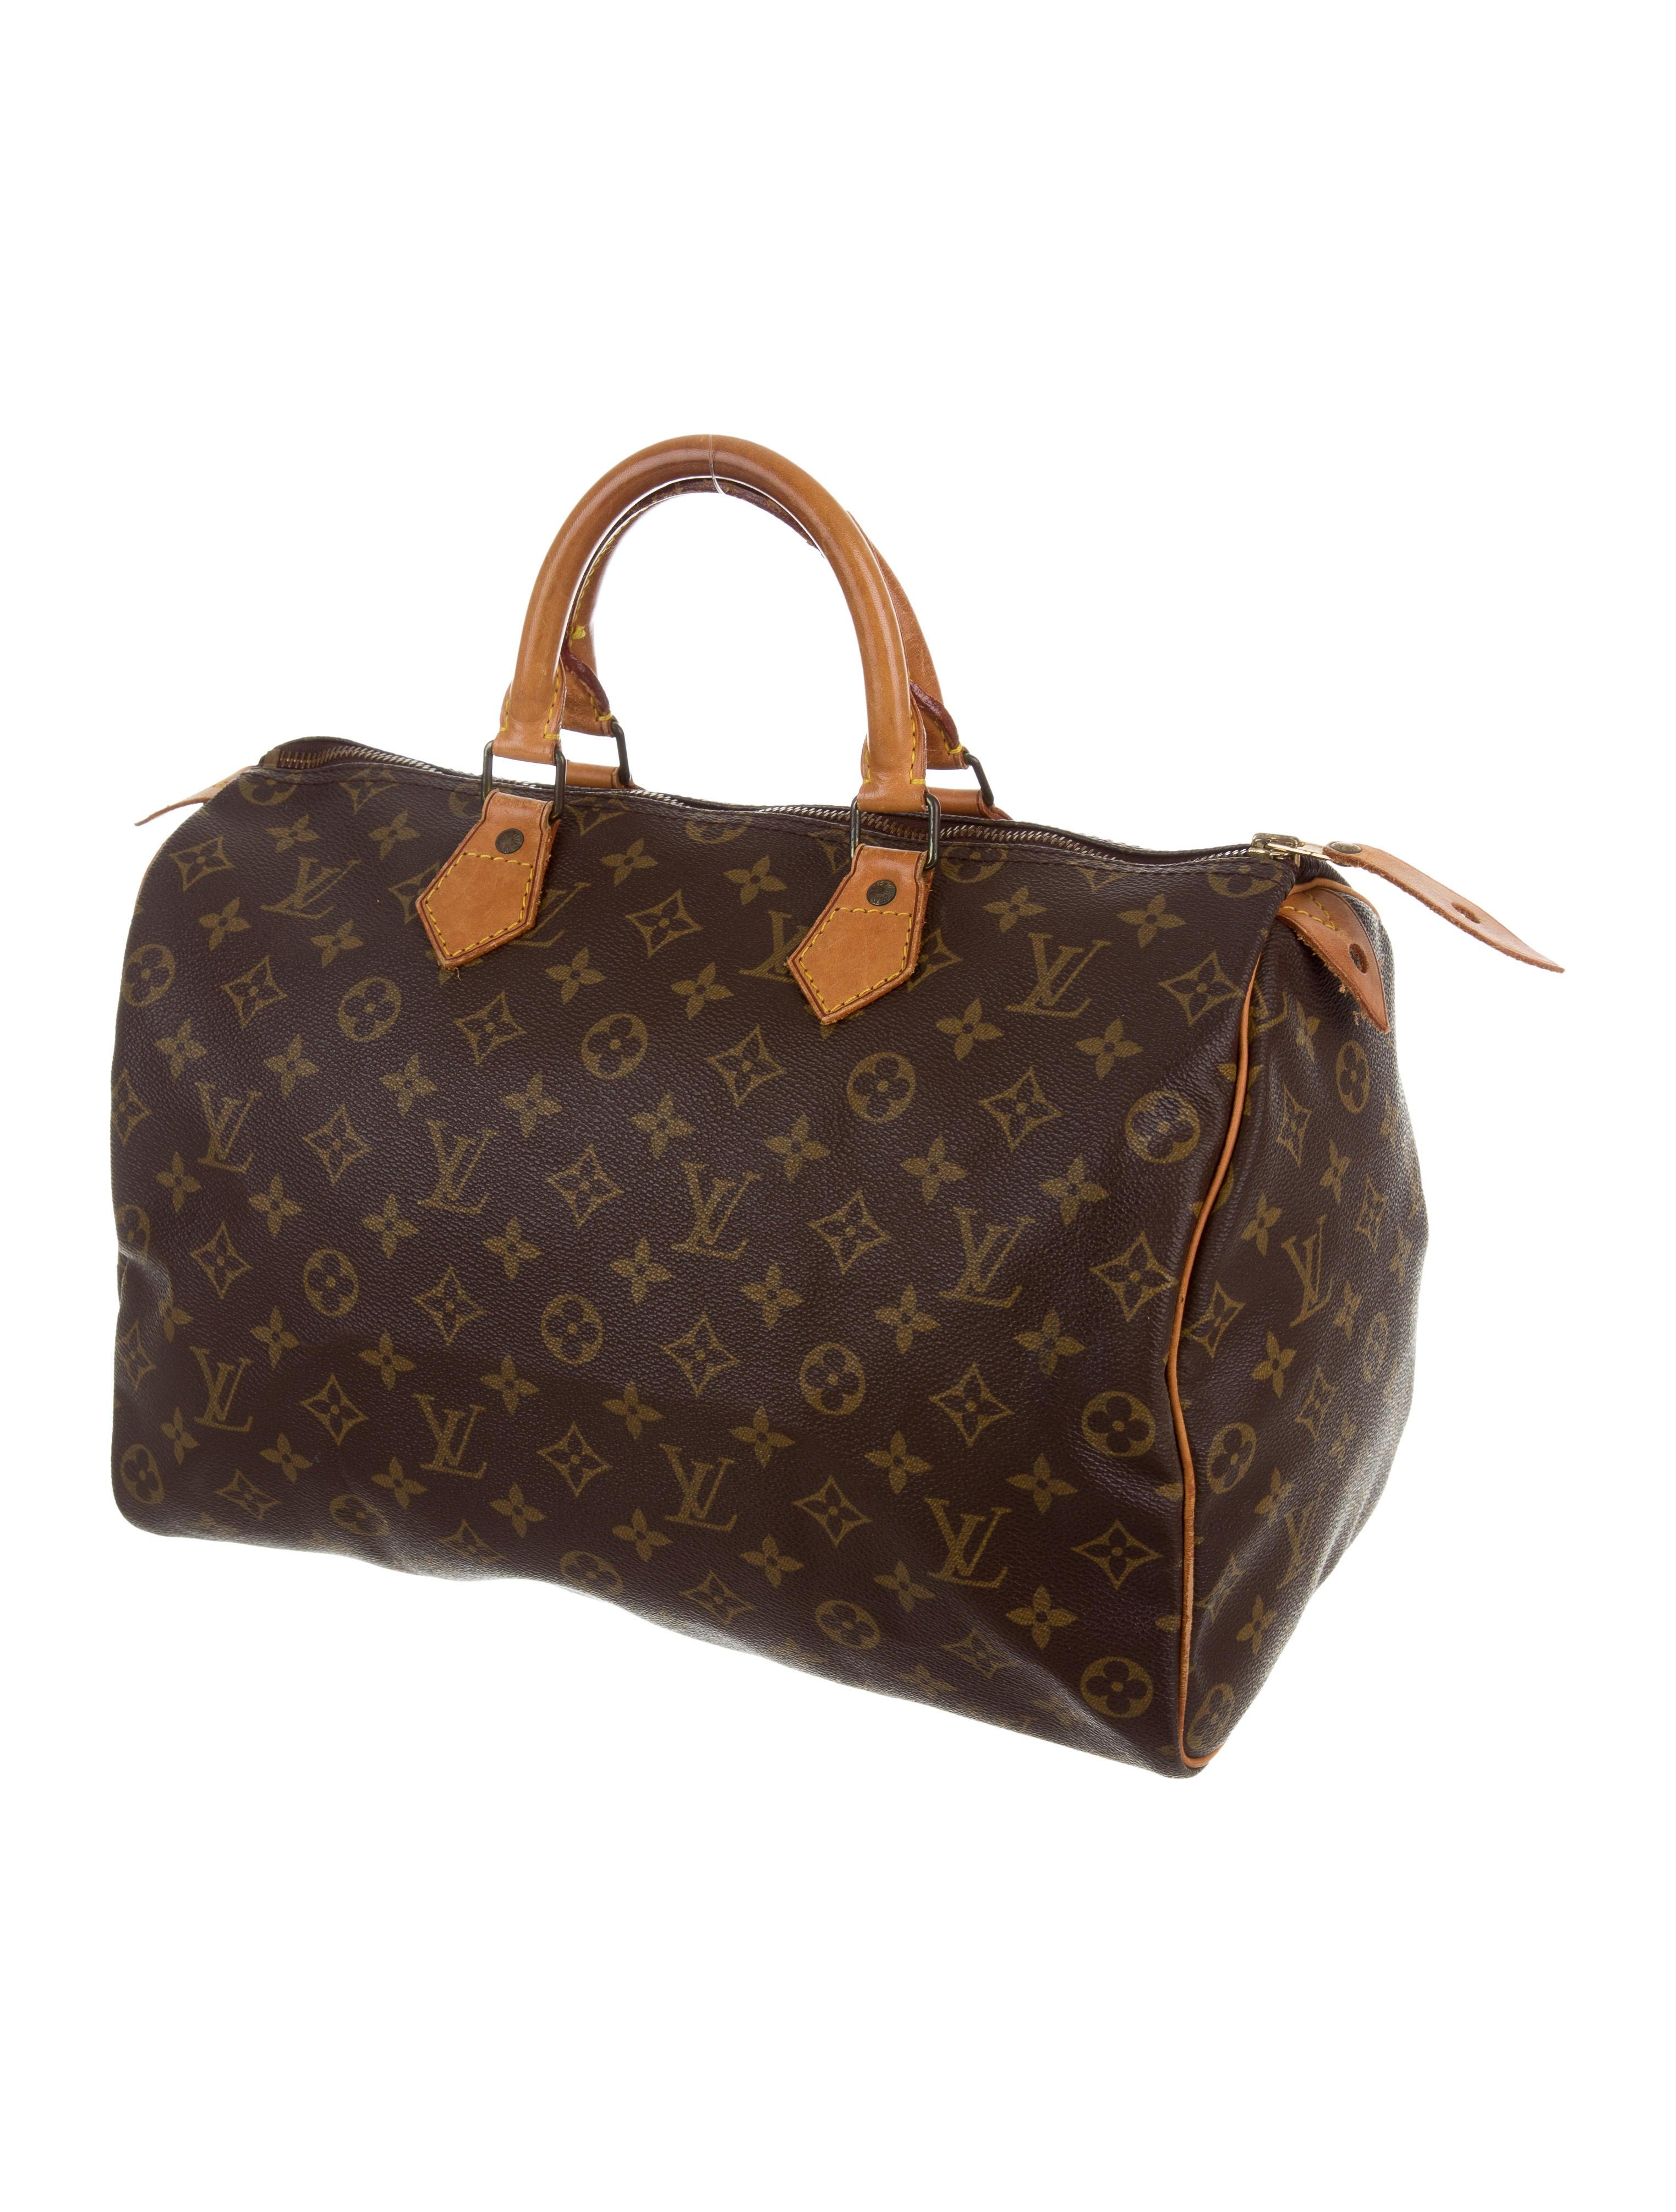 Louis vuitton monogram speedy 35 handbags lou119996 for Louis vuitton miroir speedy 35